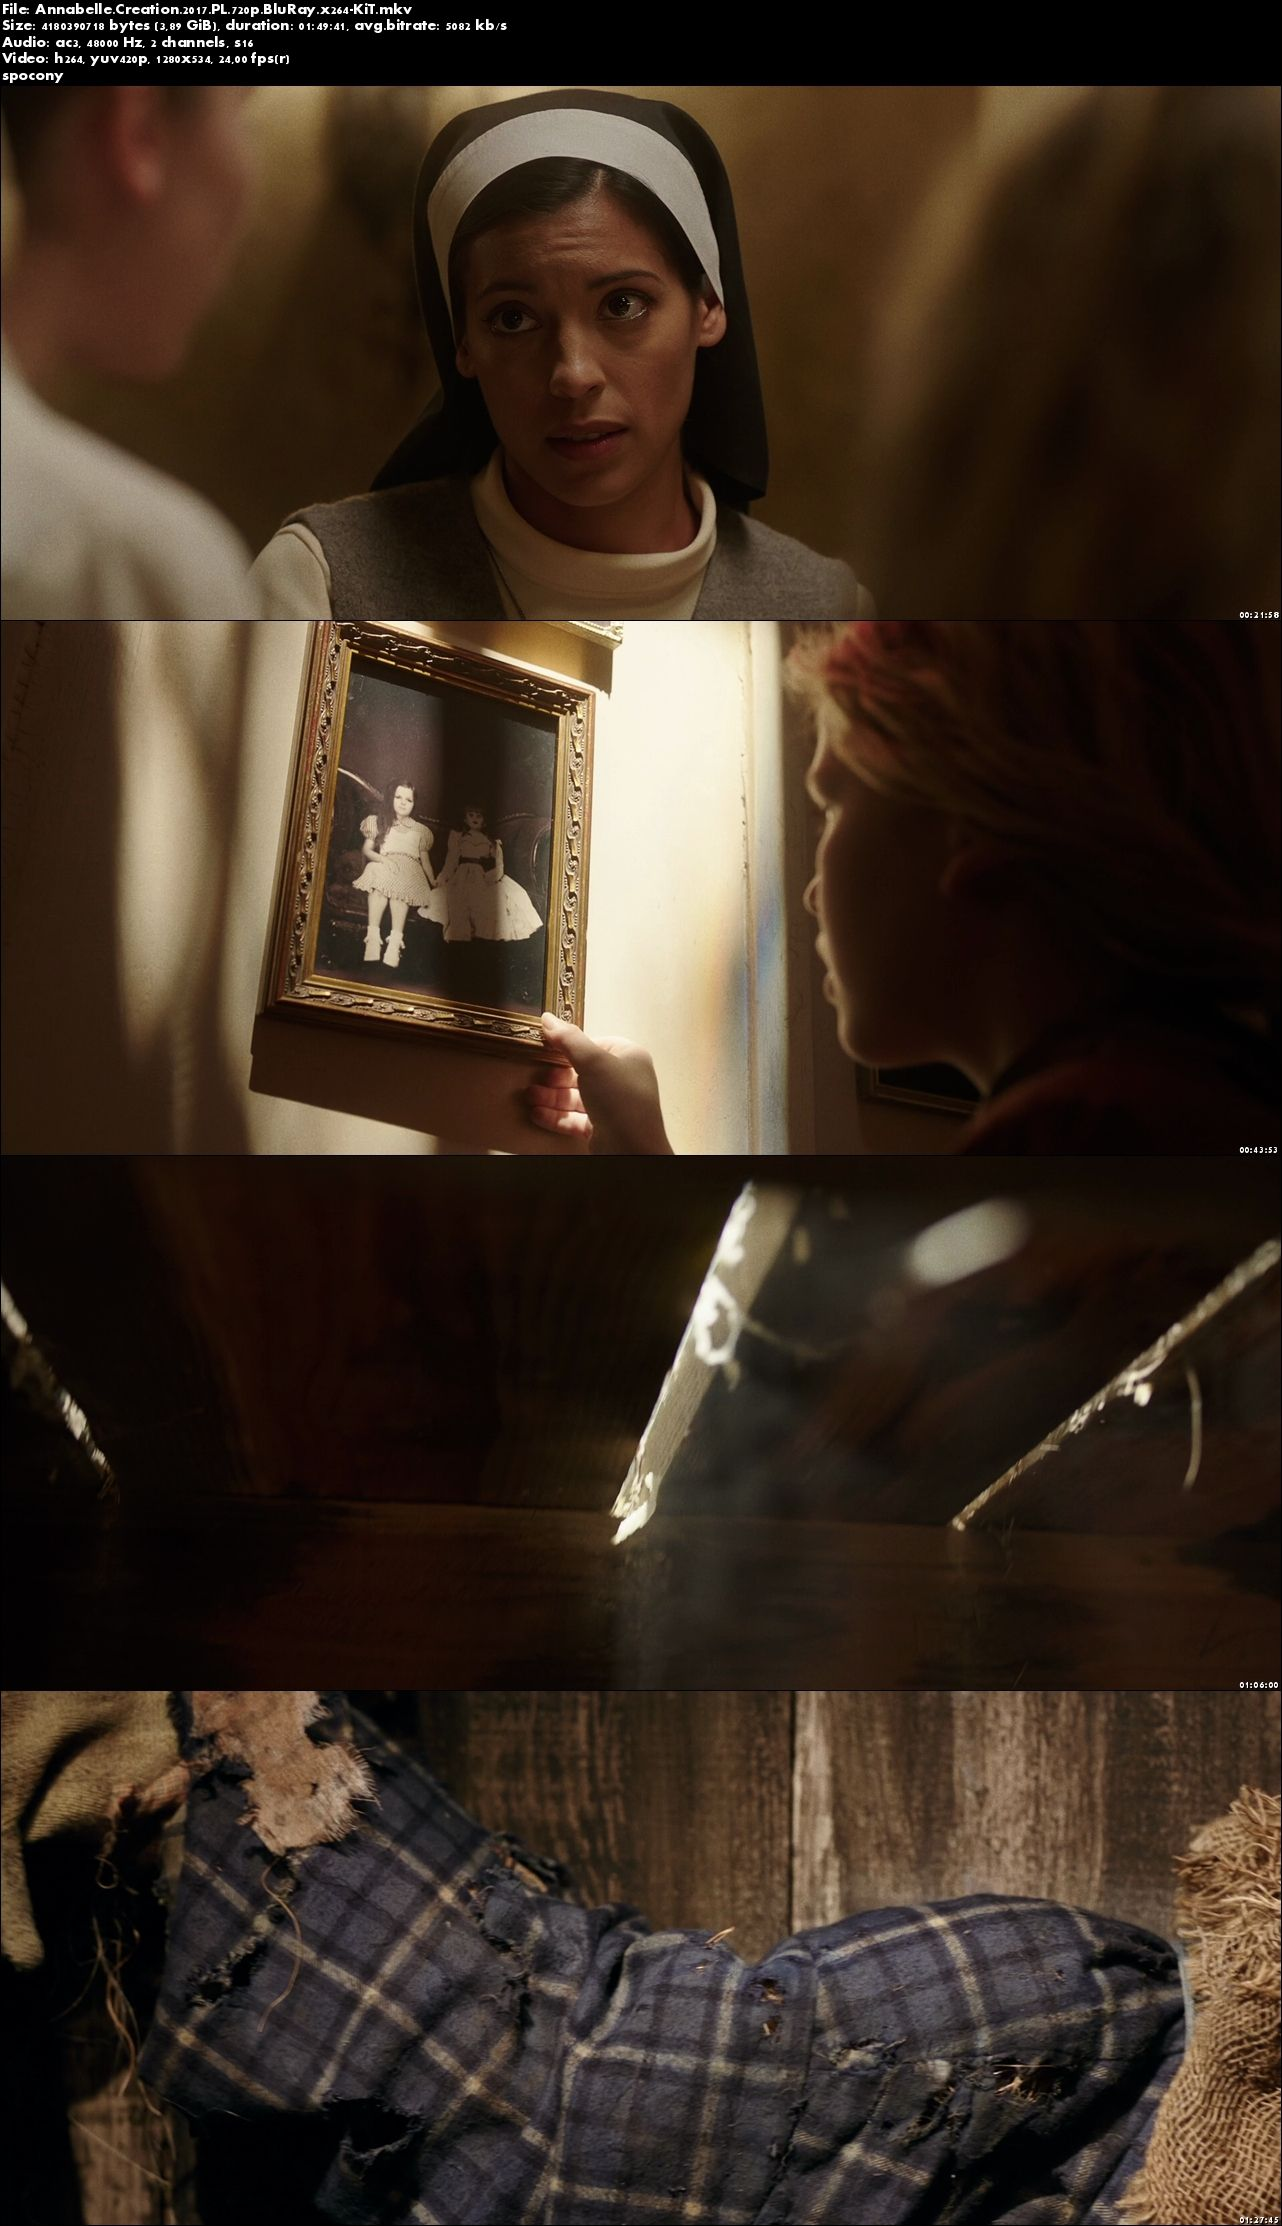 Annabelle: Narodziny zła / Annabelle: Creation (2017) PL.720p.BluRay.x264-KiT [Lektor PL]